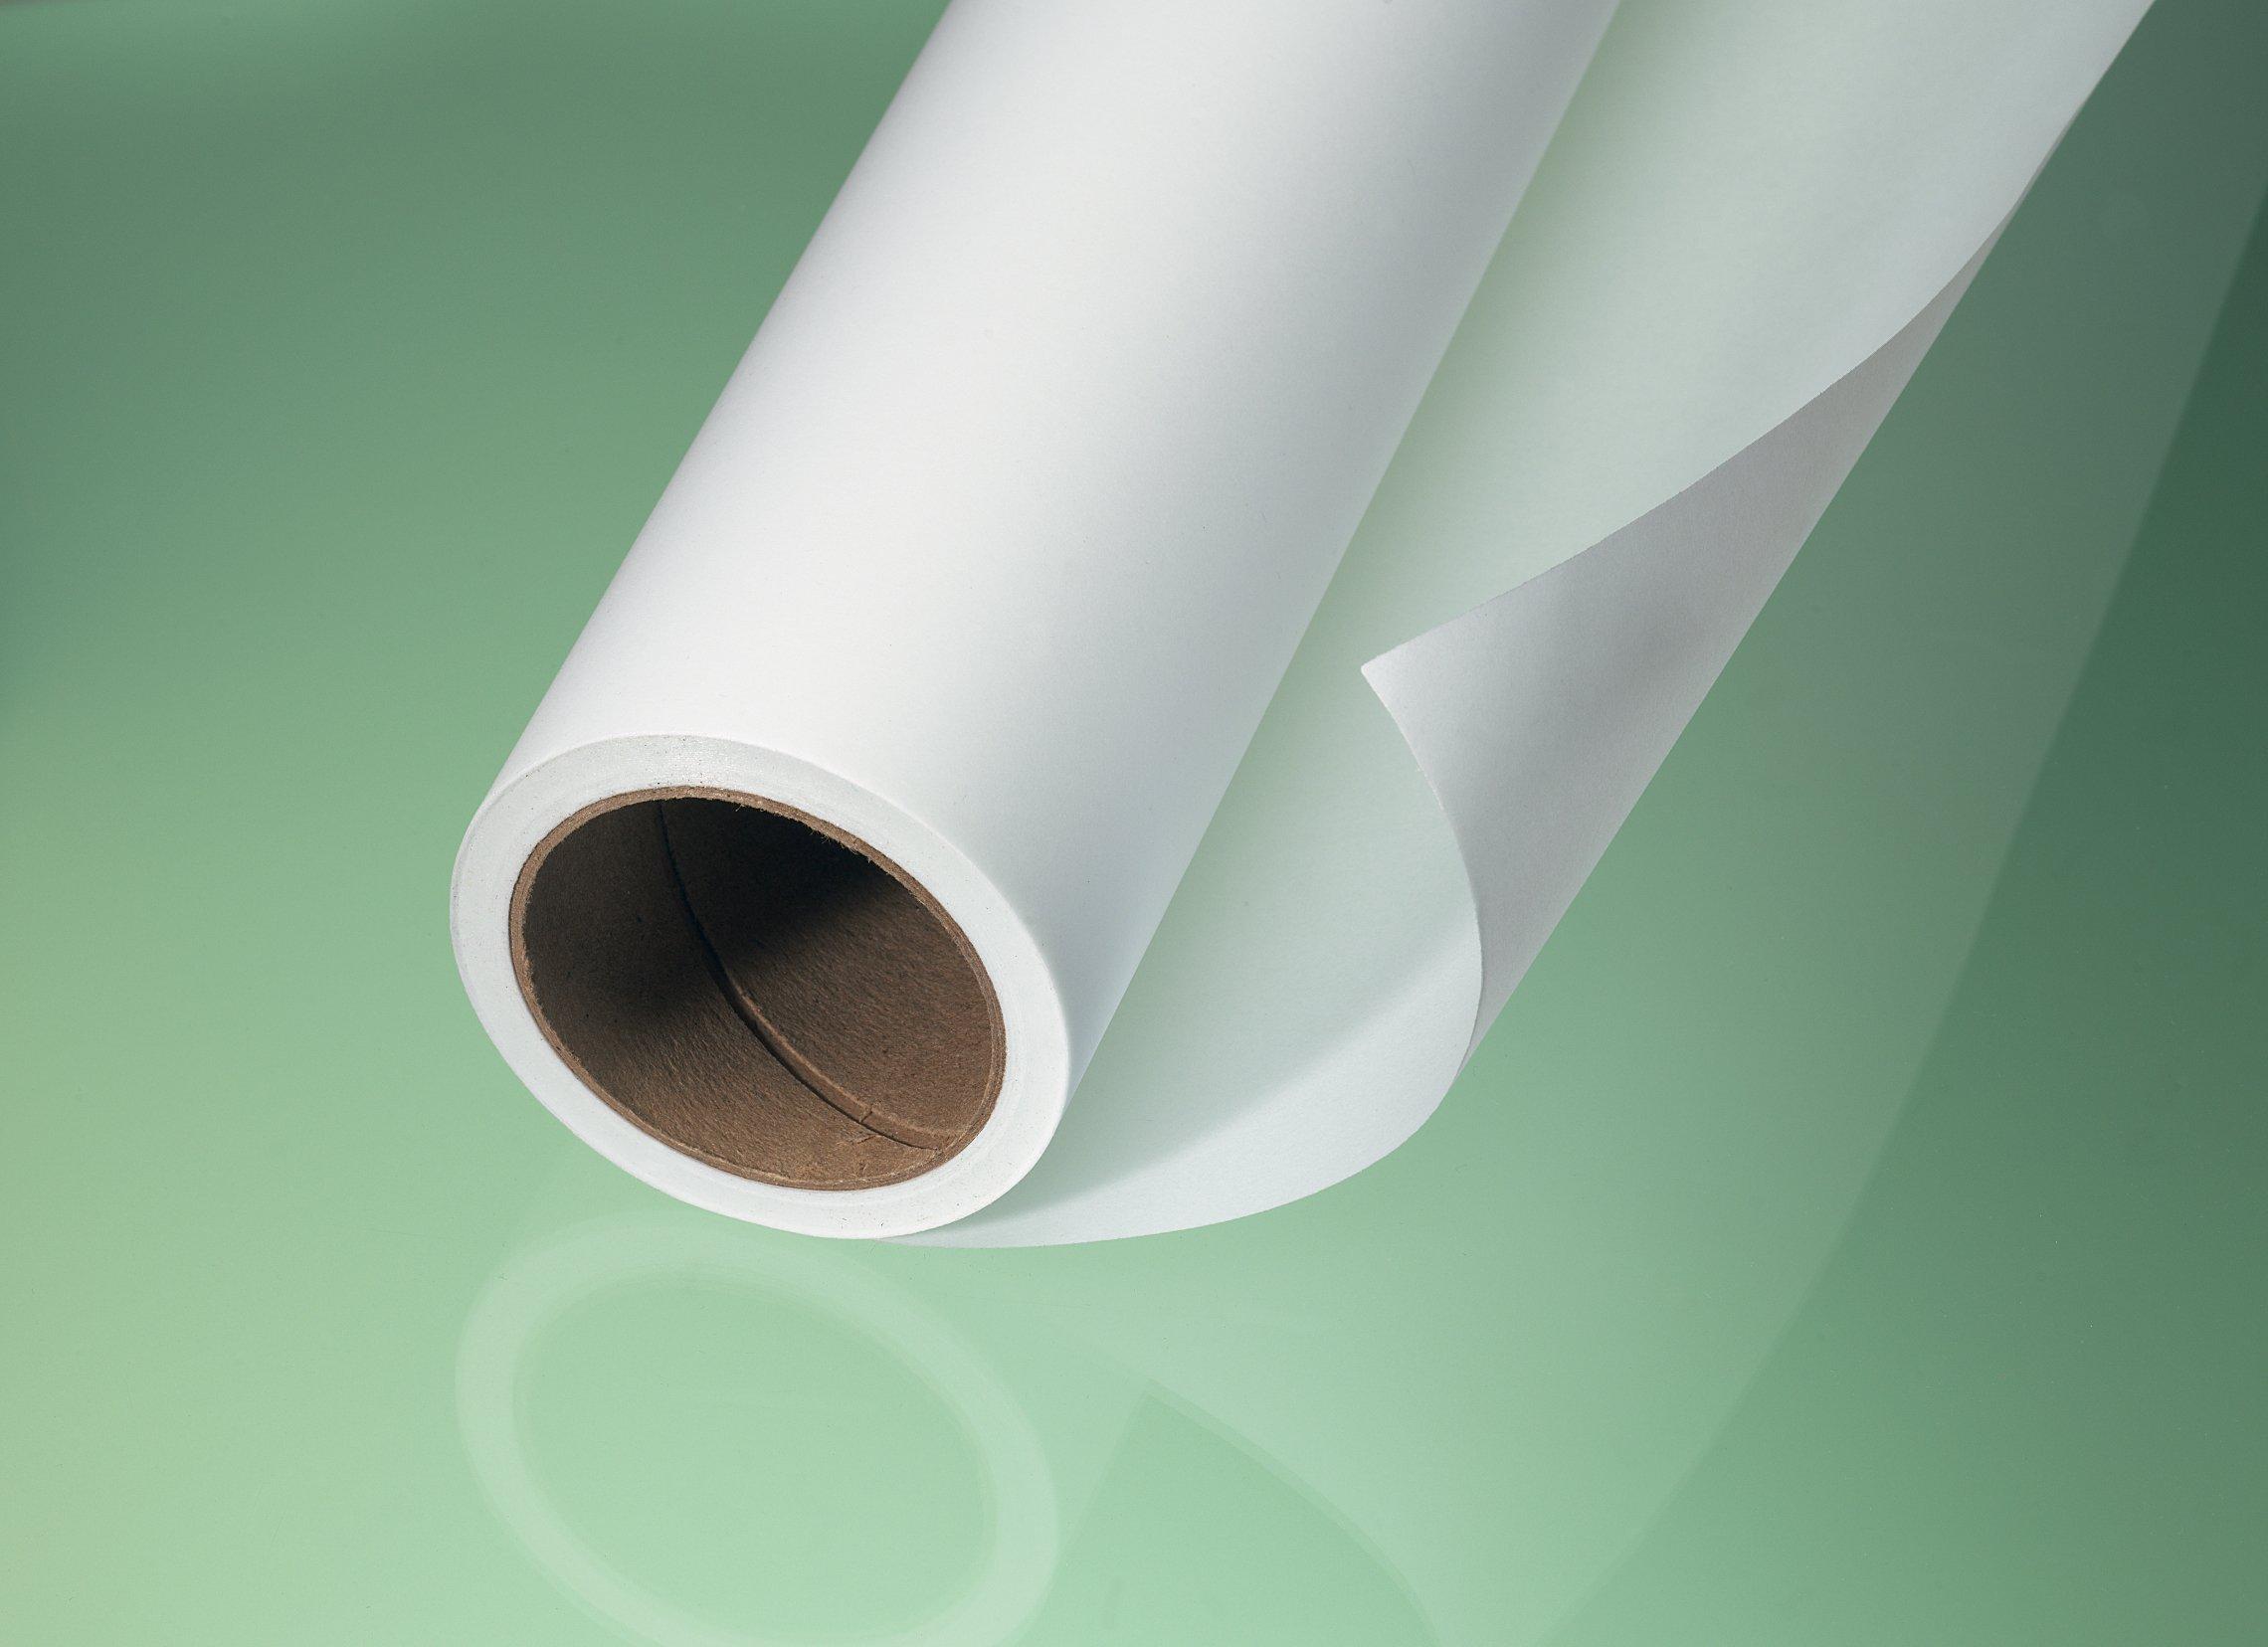 Alvin 6855X-17 Alva-Line 100 percent Rag Vellum Tracing Paper 100-Sheet Pack 8x8 Grid 18 inches x 24 inches